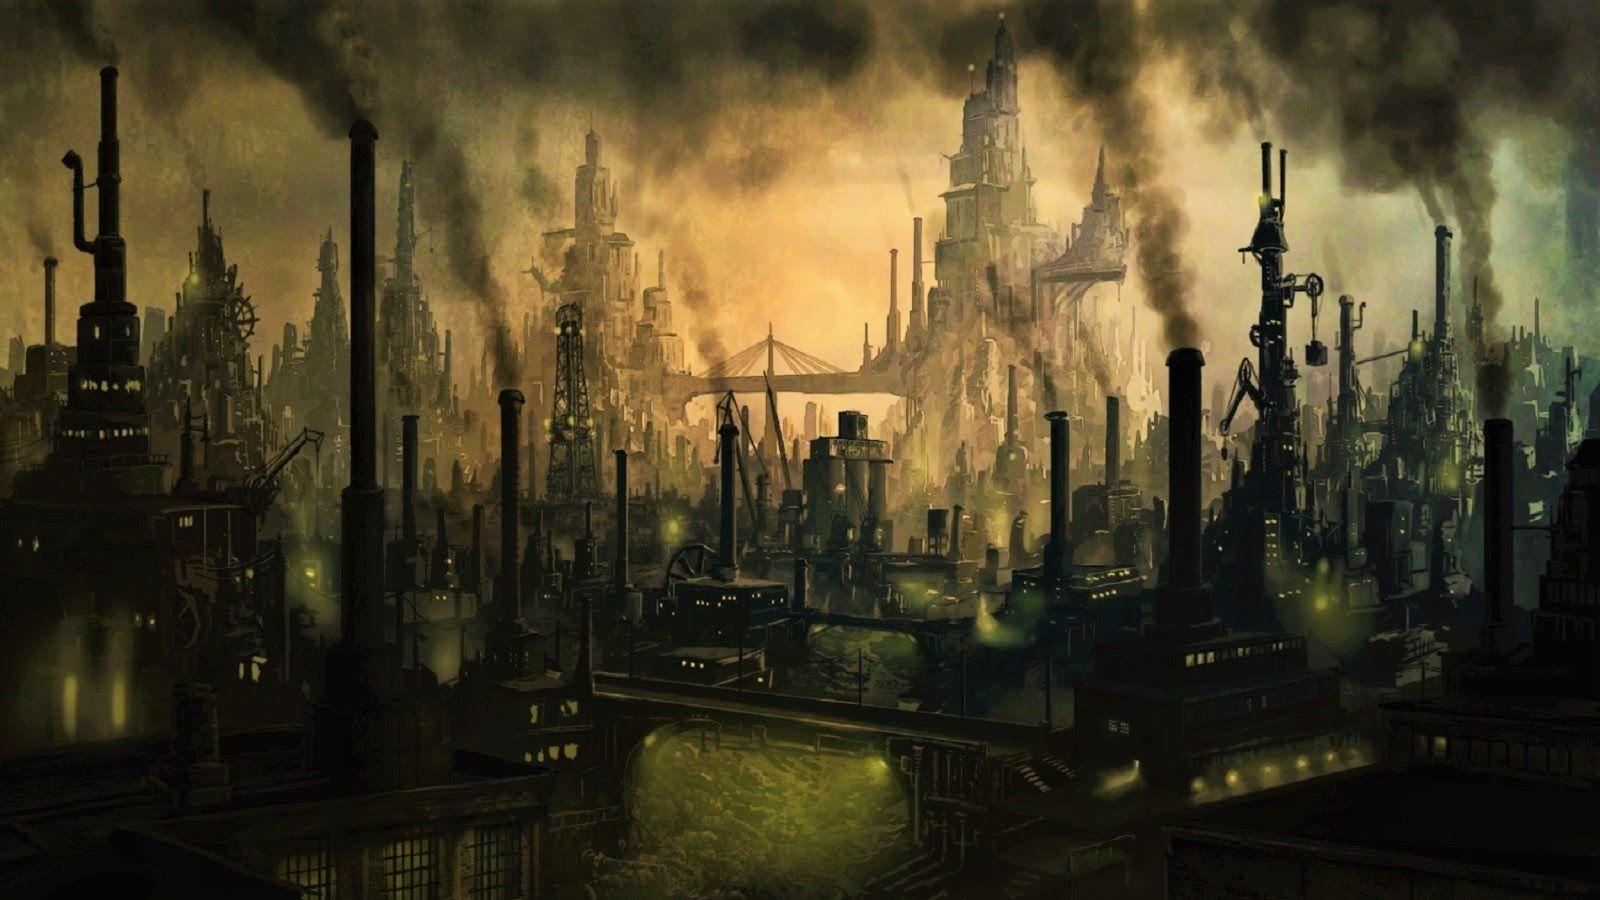 Dark Steampunk Music - Illusions And Smoke